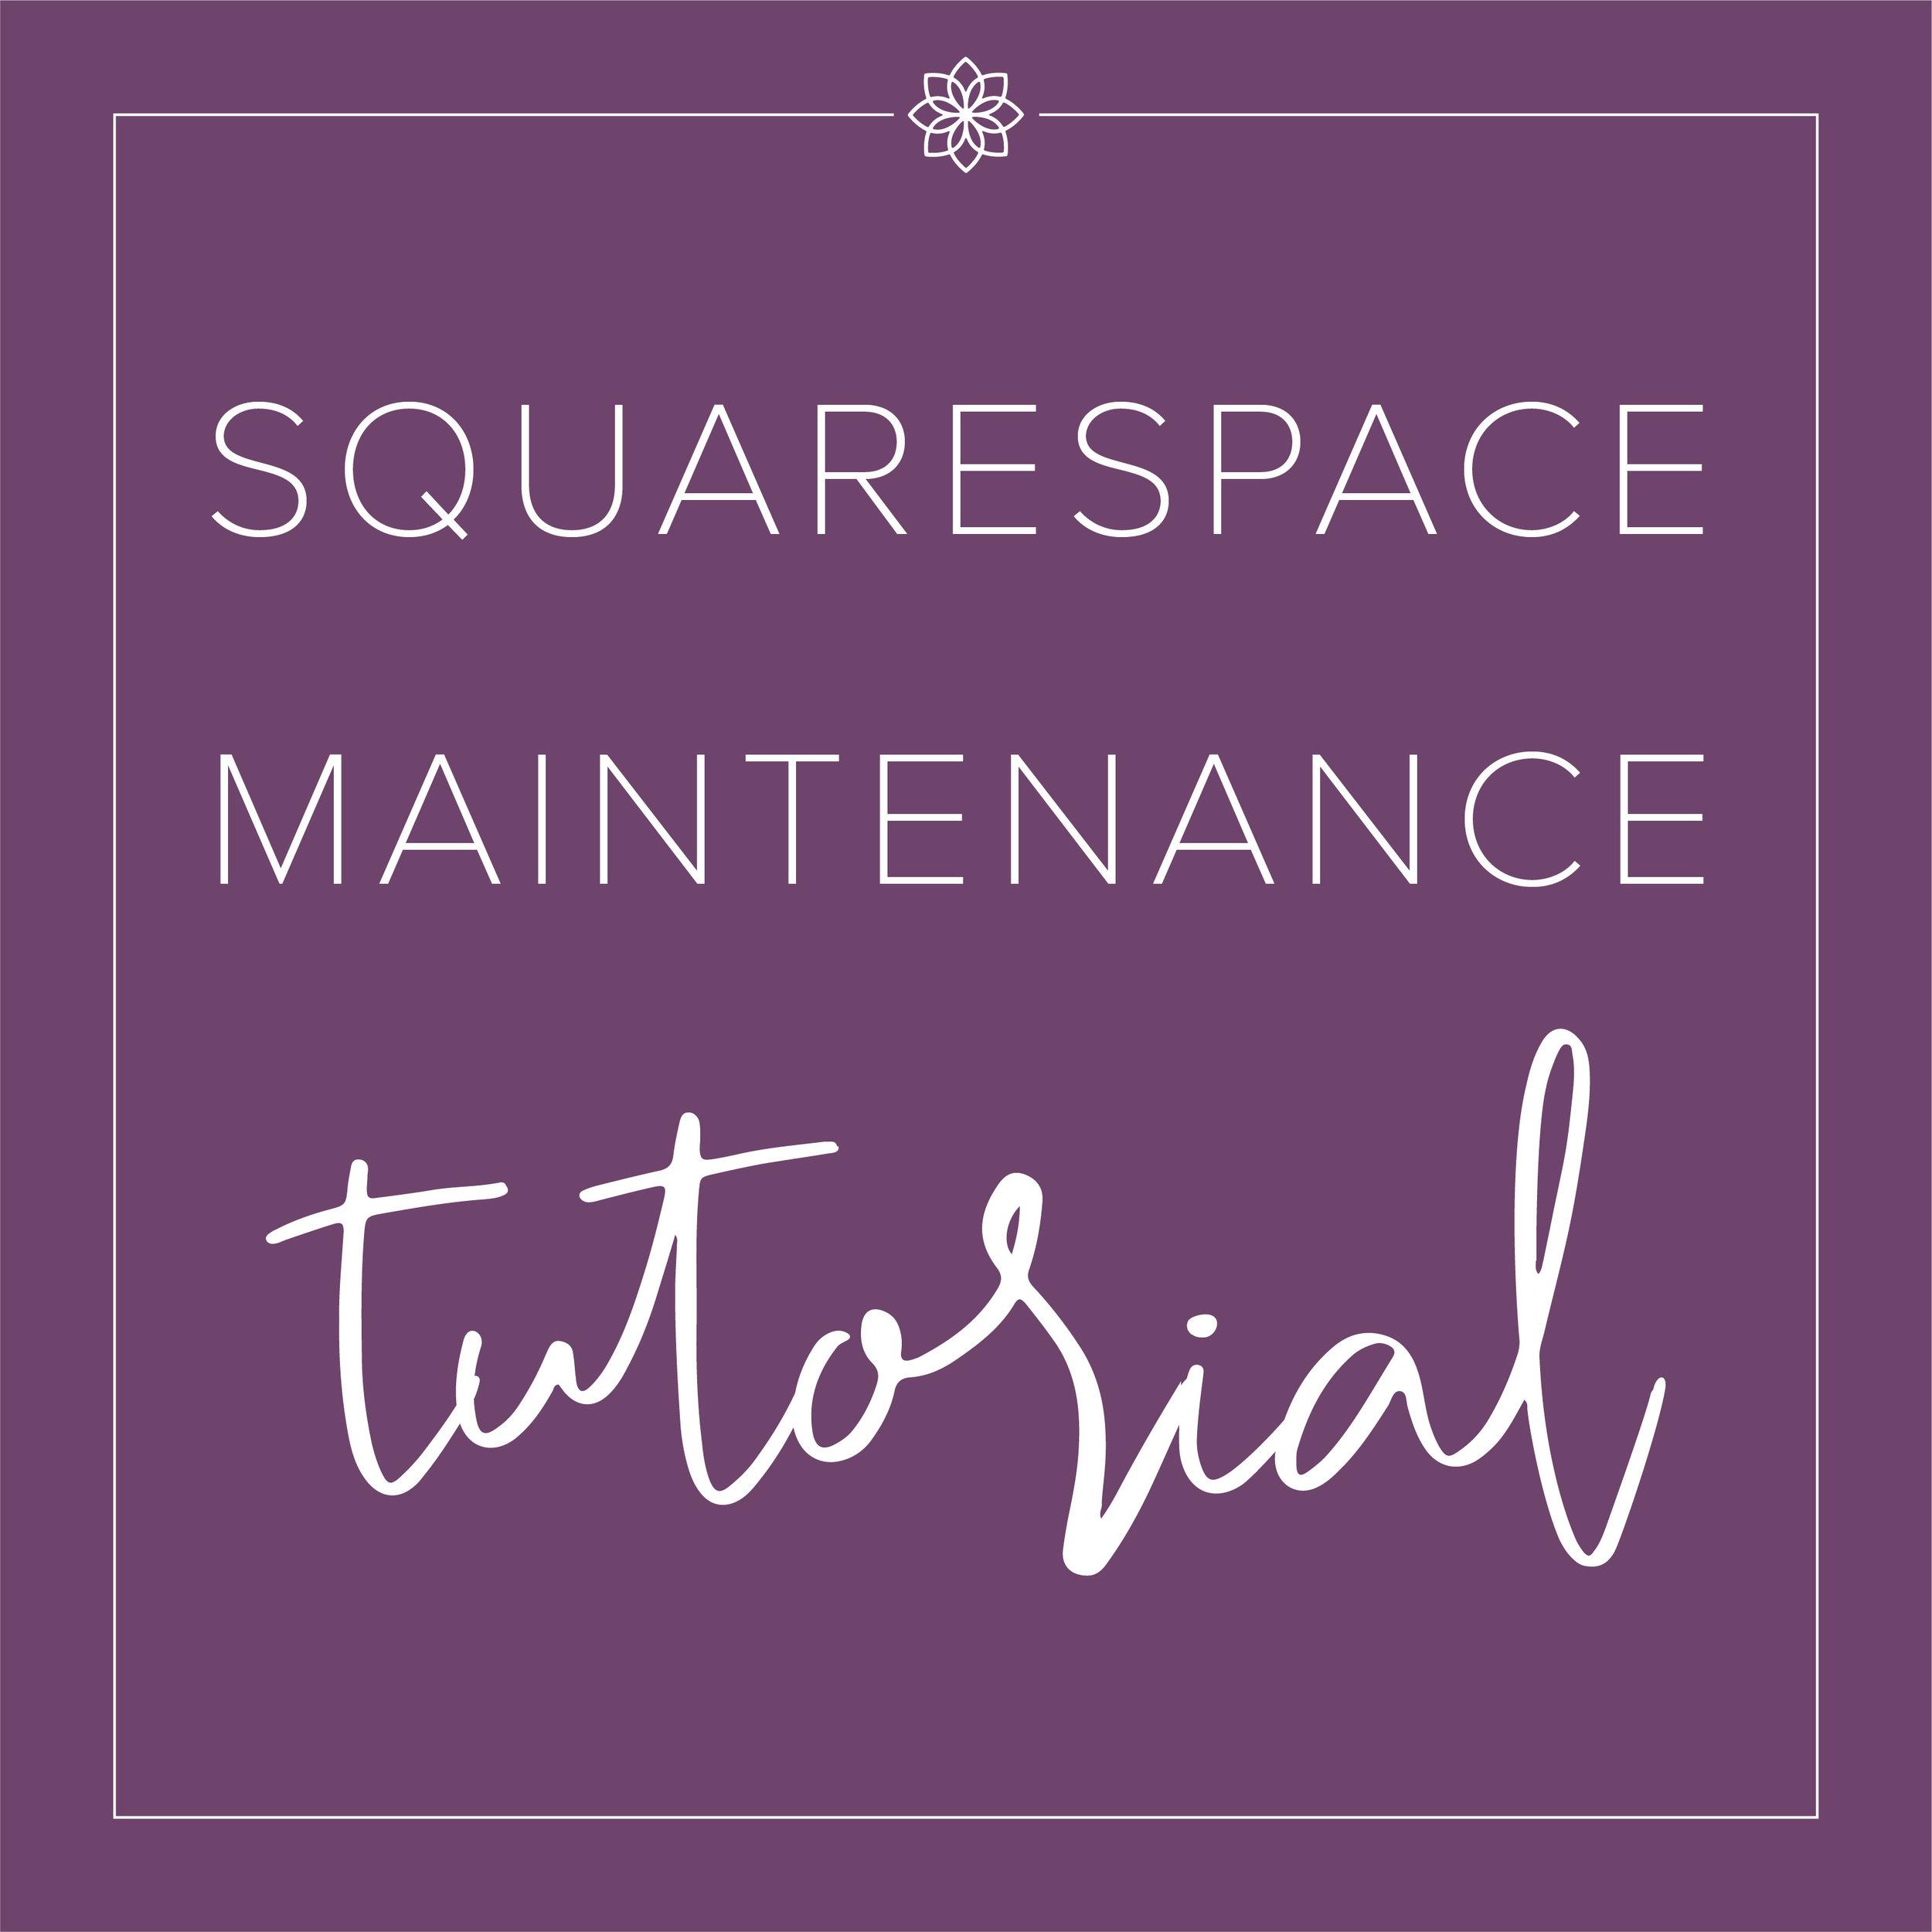 squarespacemainttut.jpg